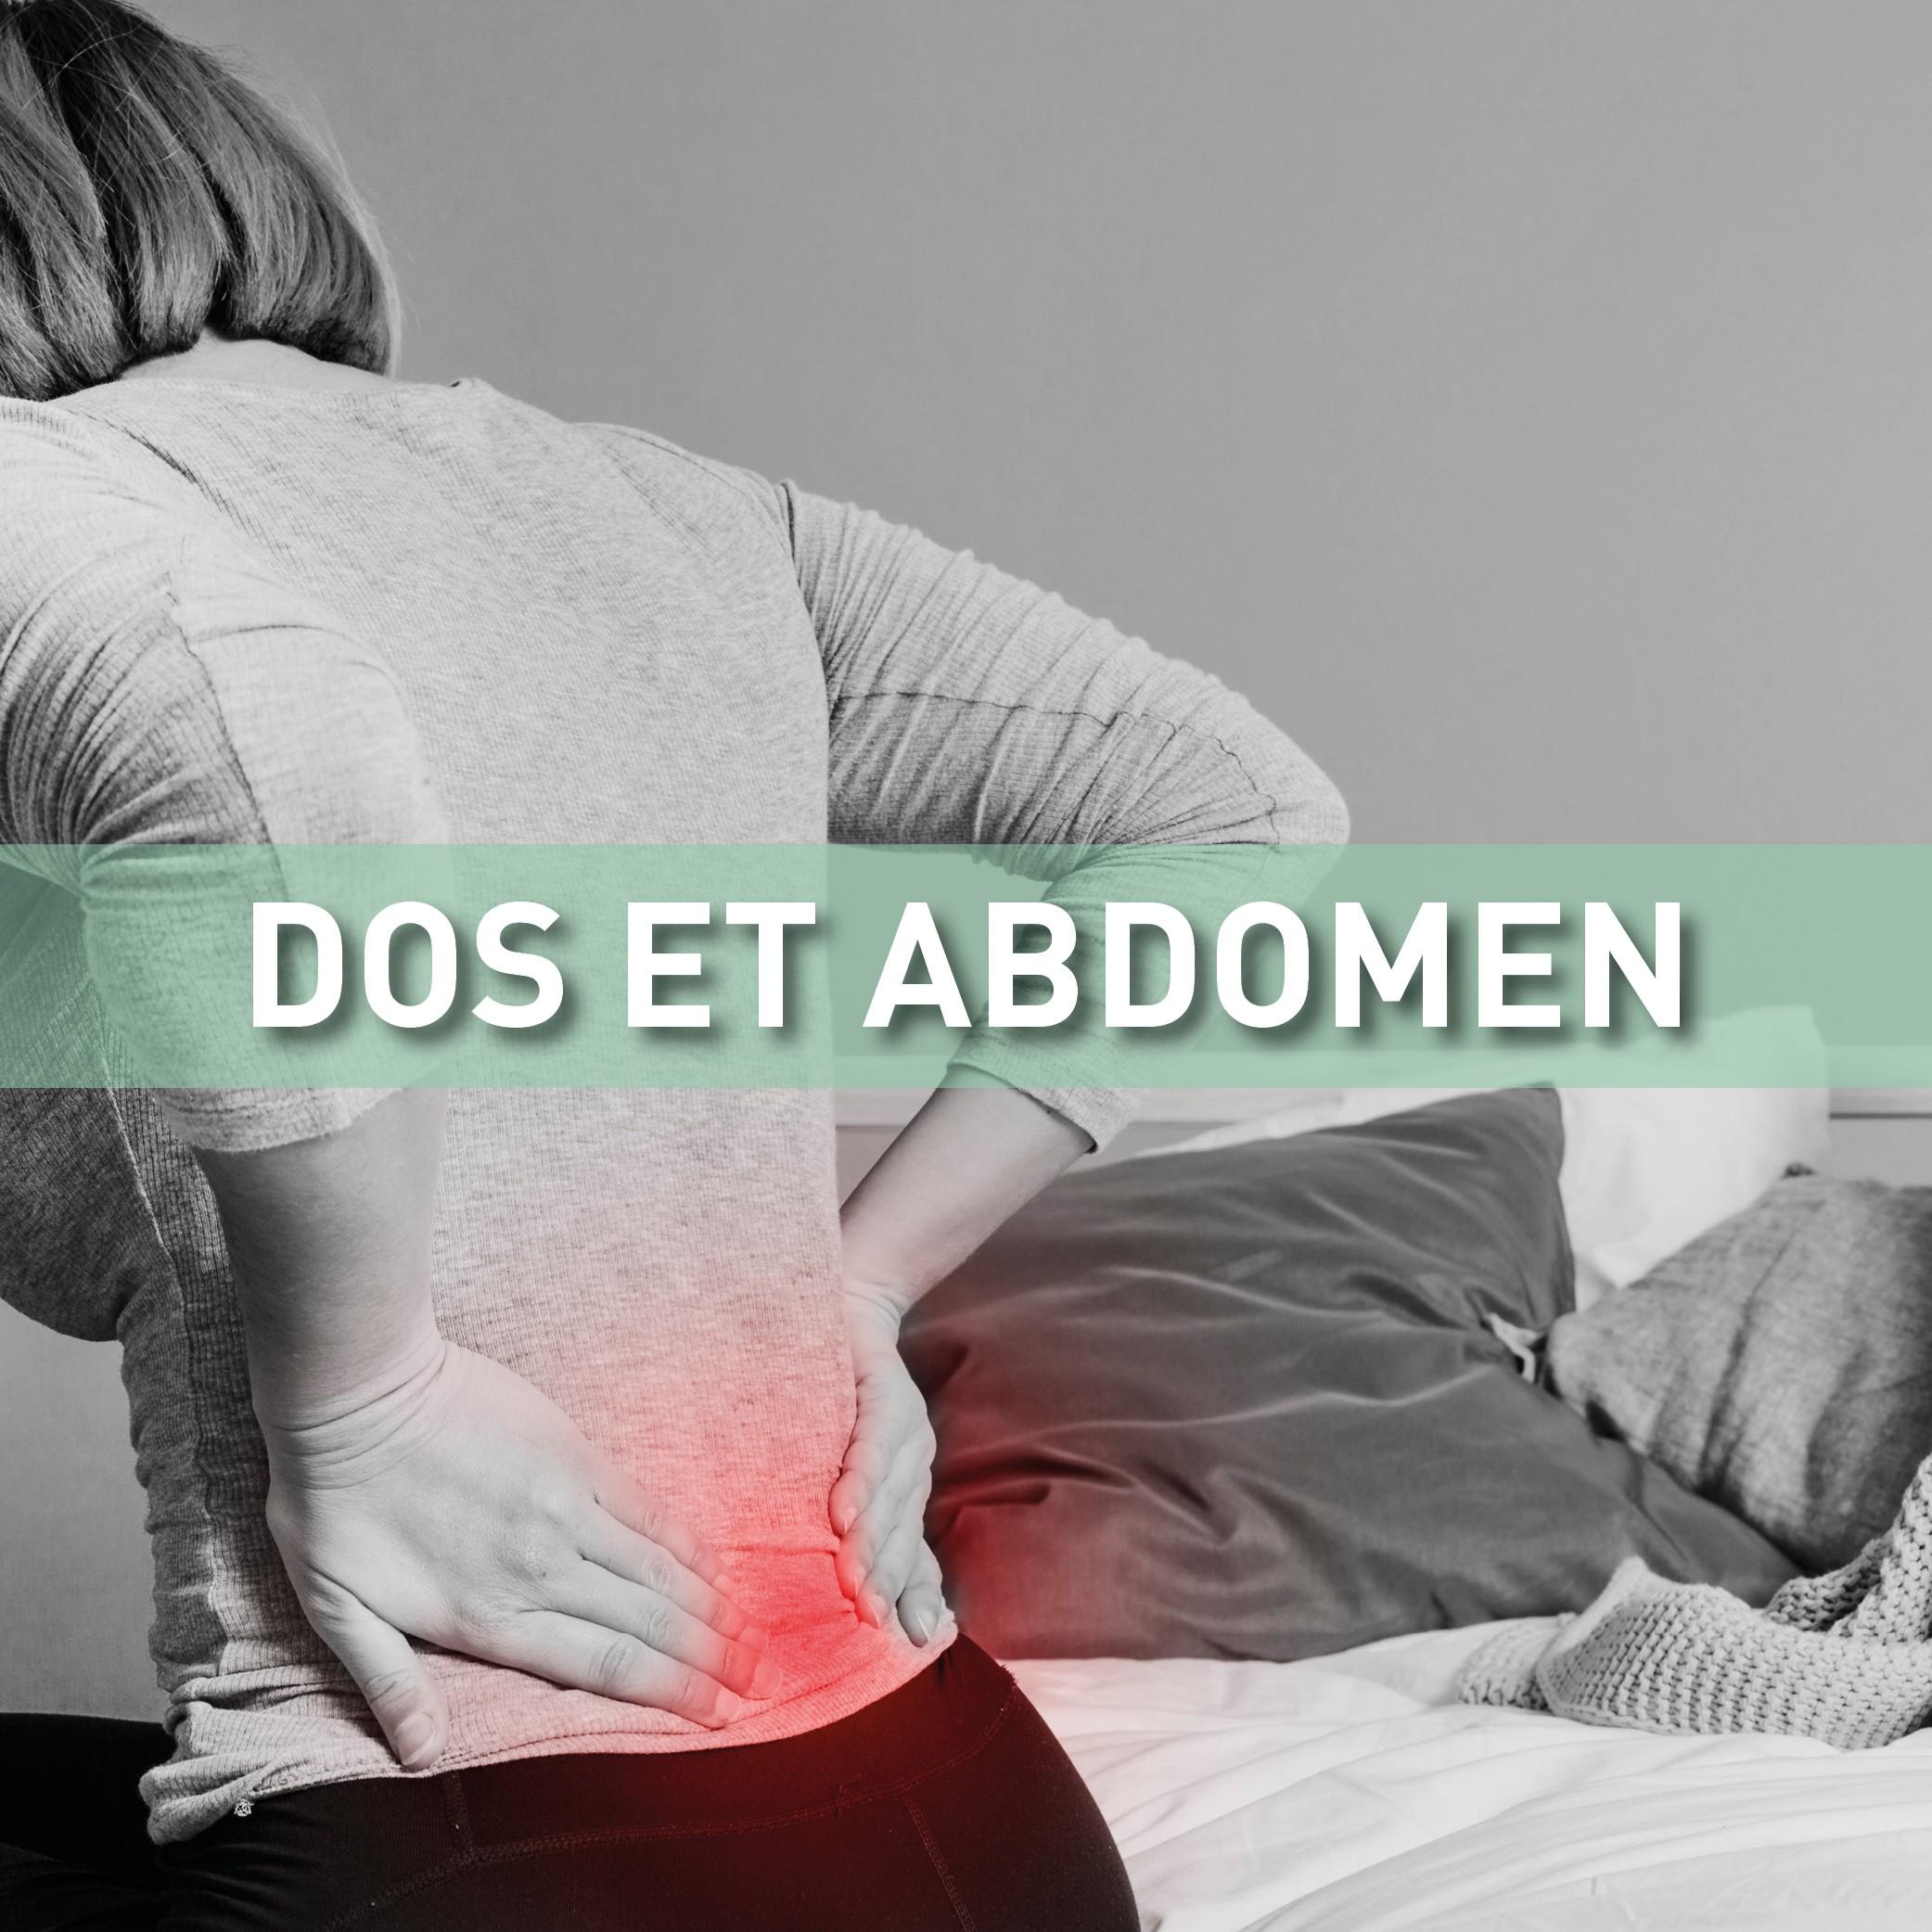 Dos et abdomen